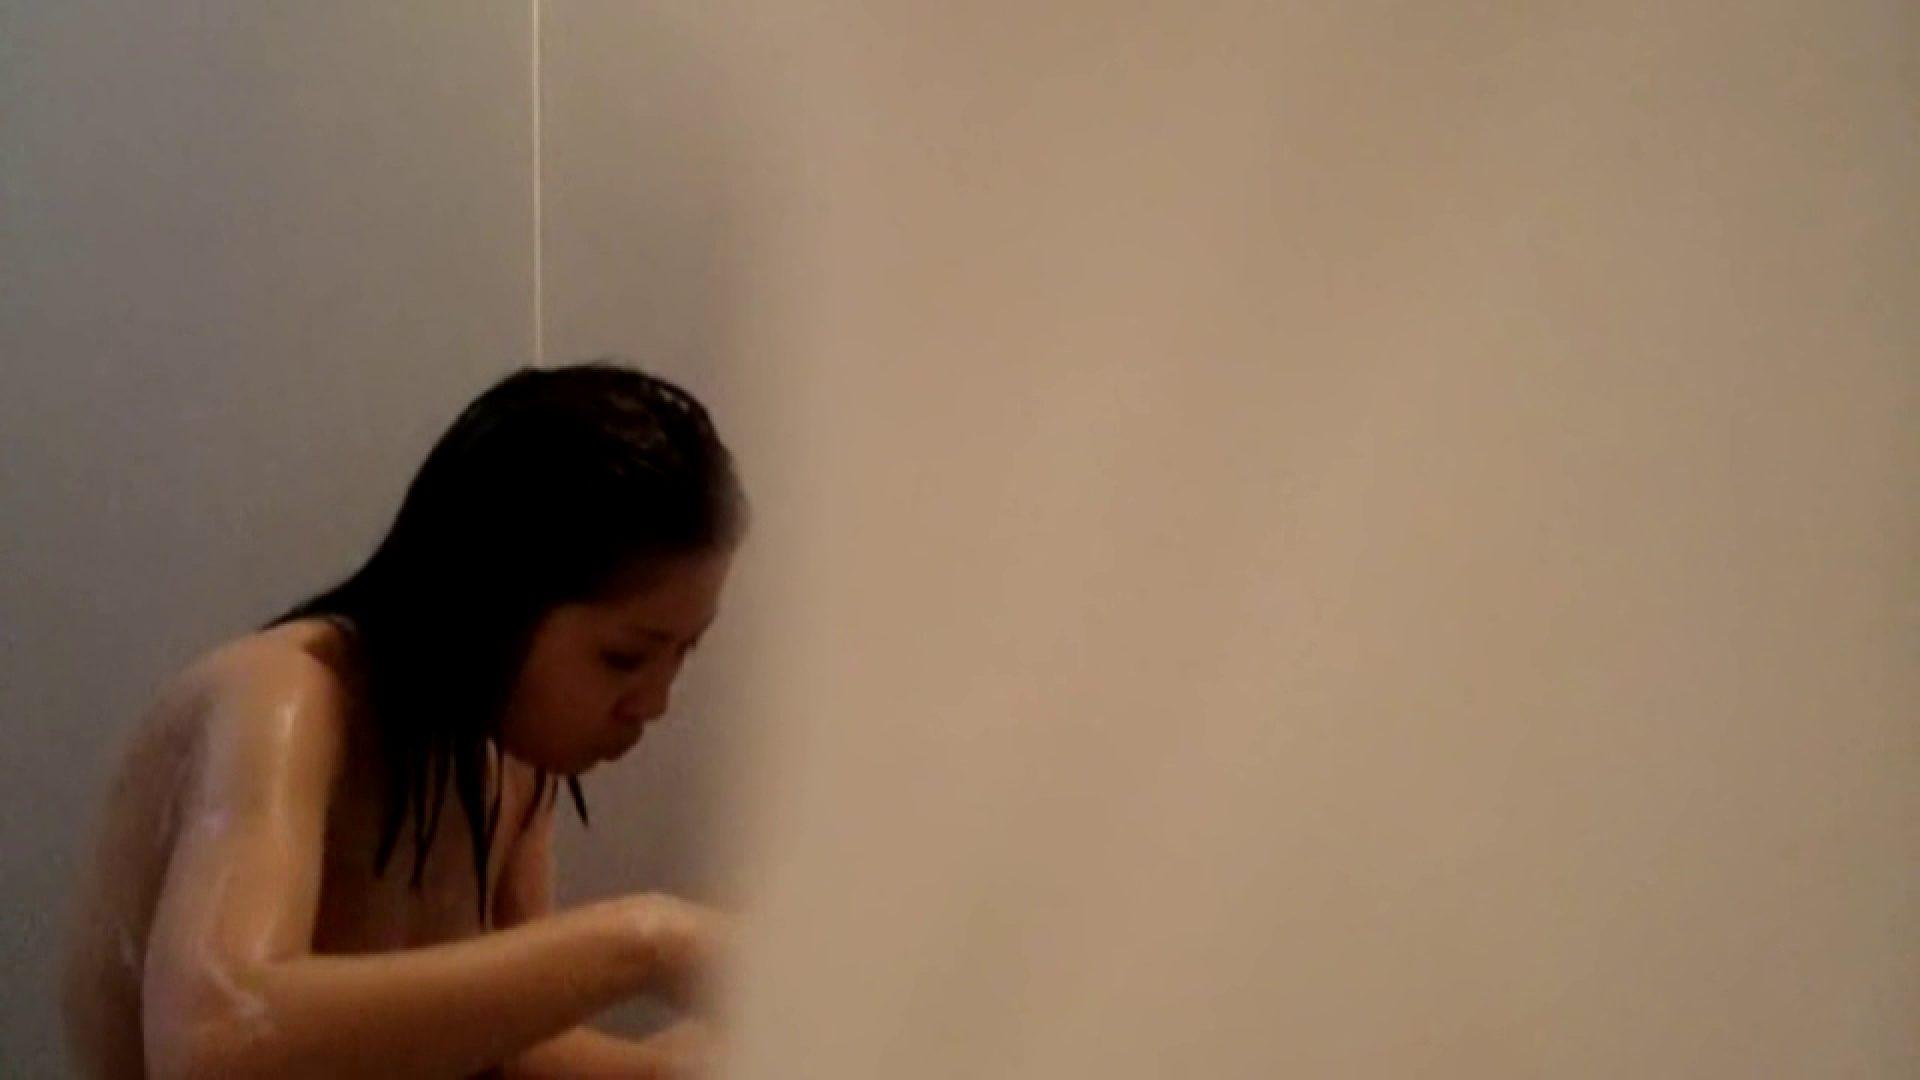 vol.2 葵のグラドル顔負けの爆乳を入浴シーンでどうぞ。 巨乳 エロ無料画像 111画像 101